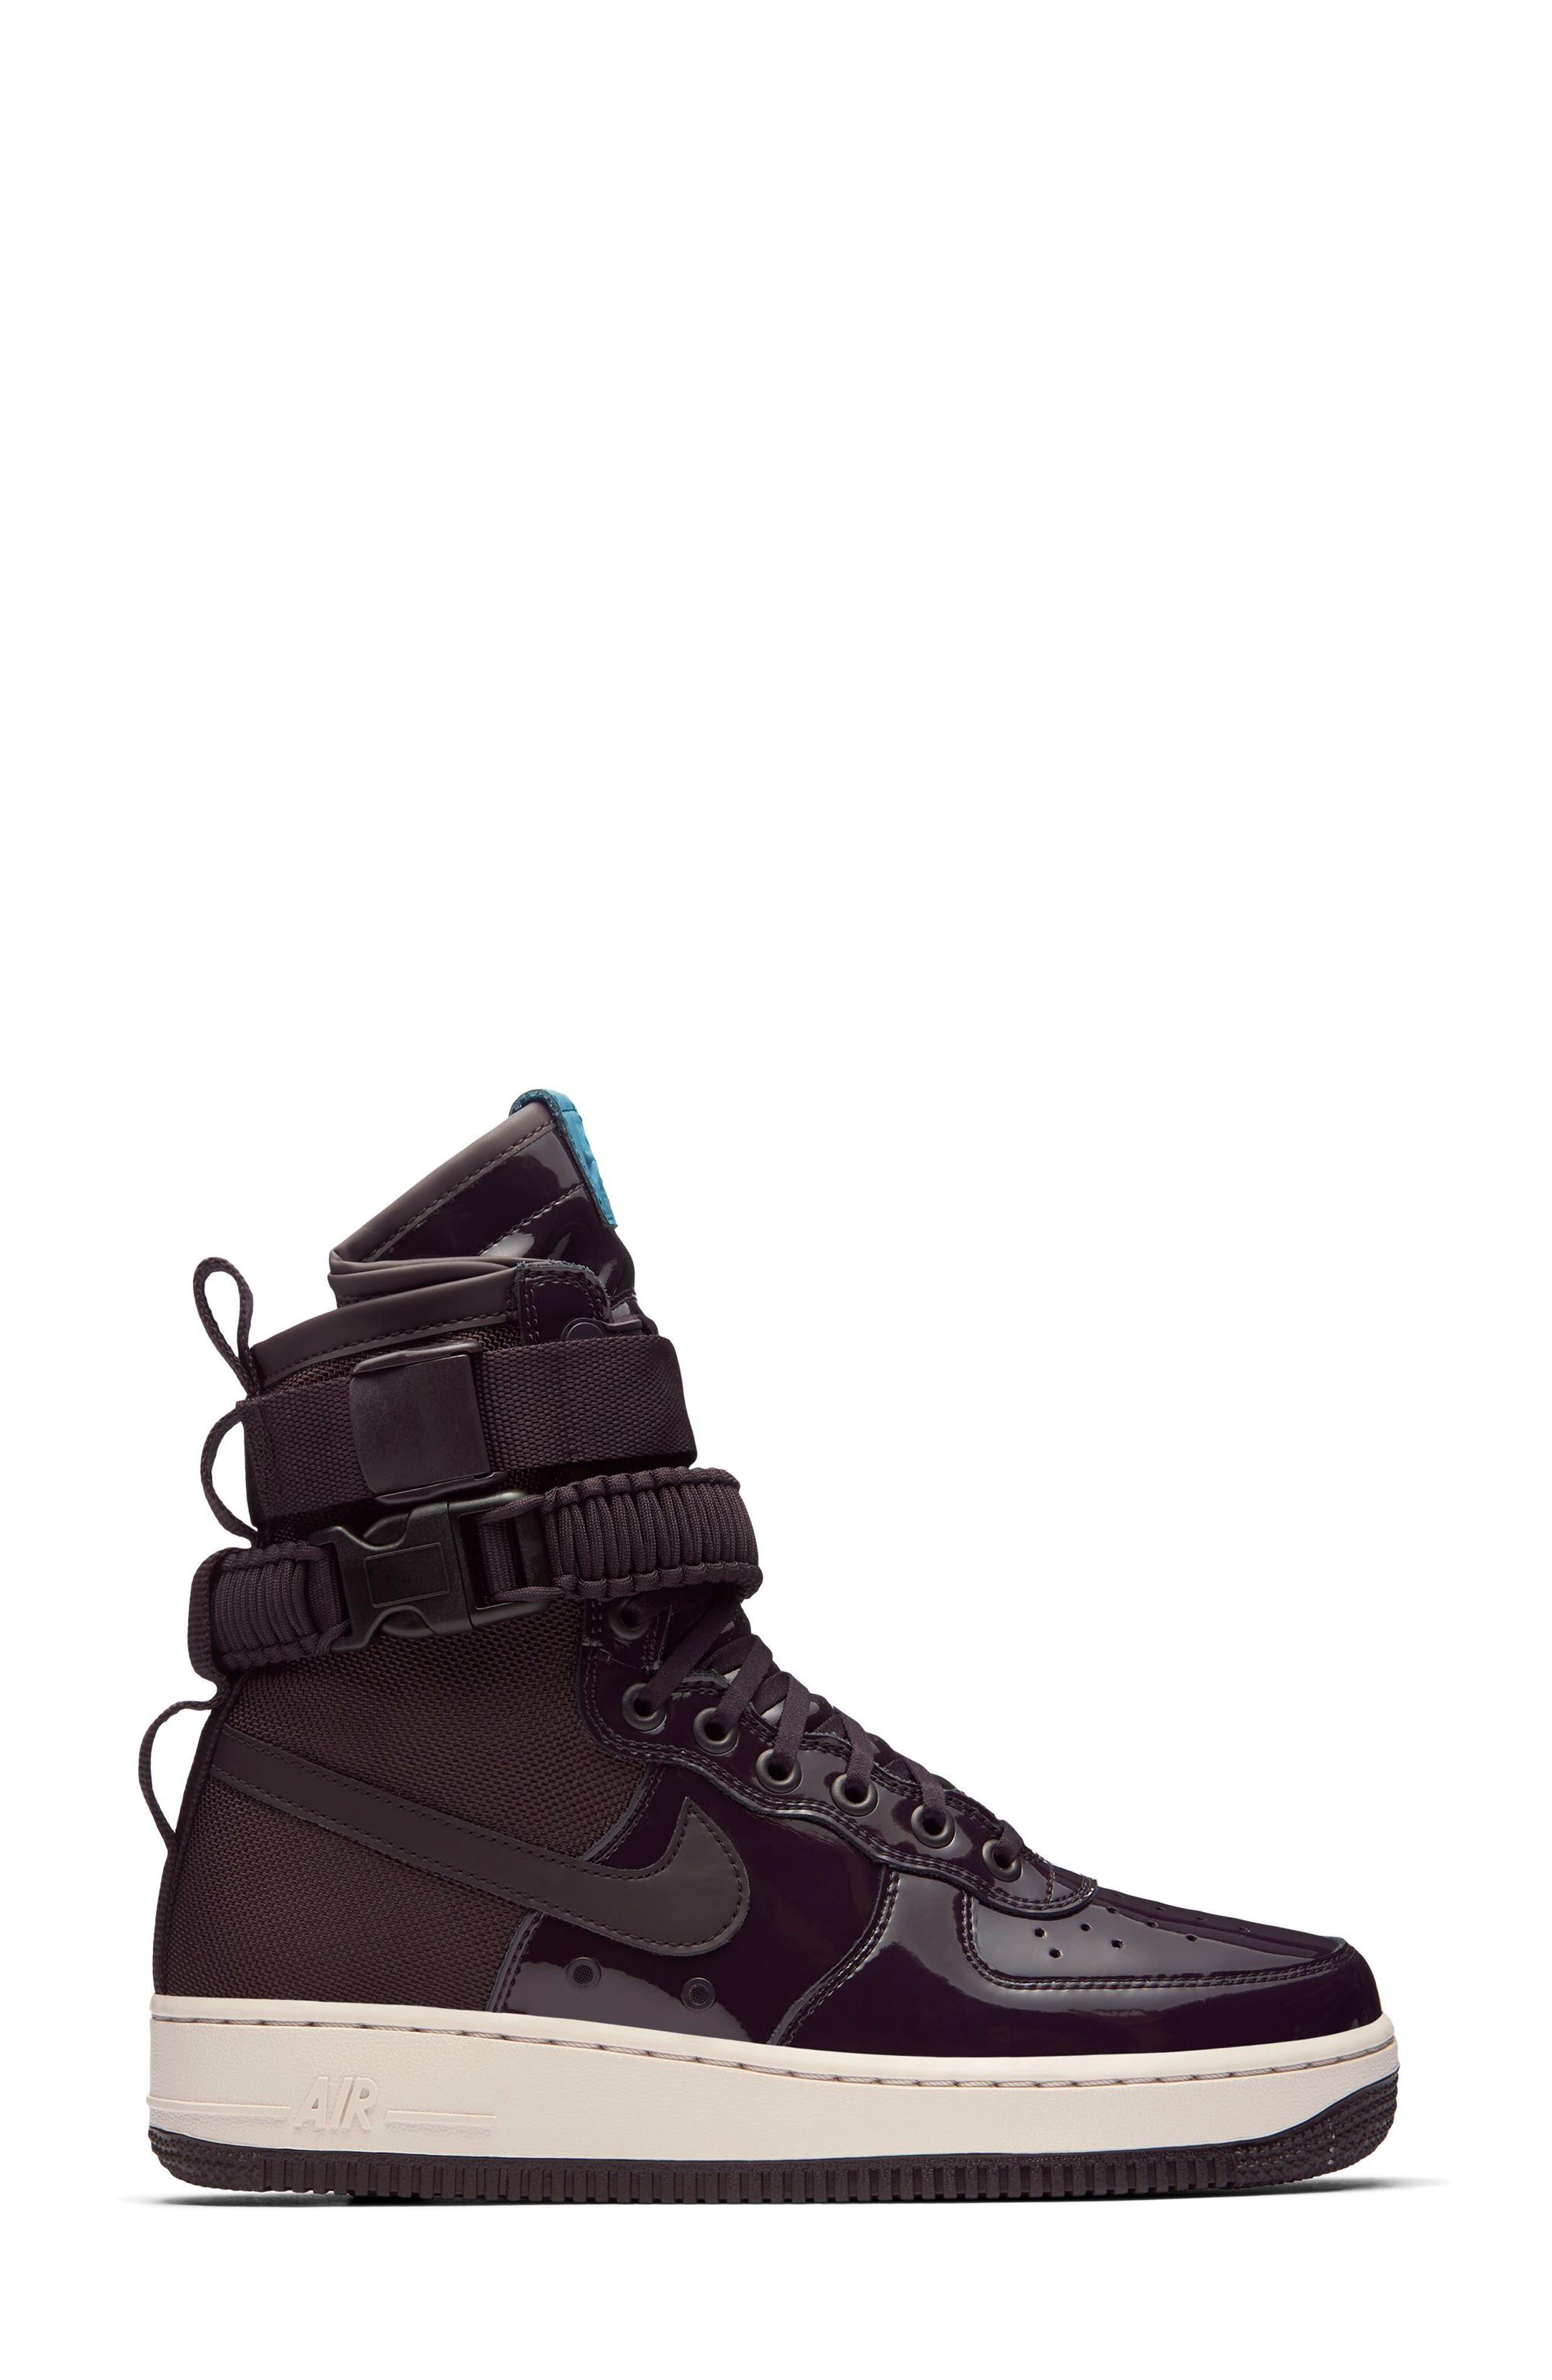 SF Air Force 1 High Top Sneaker,                             Alternate thumbnail 5, color,                             Port Wine/ Port Wine